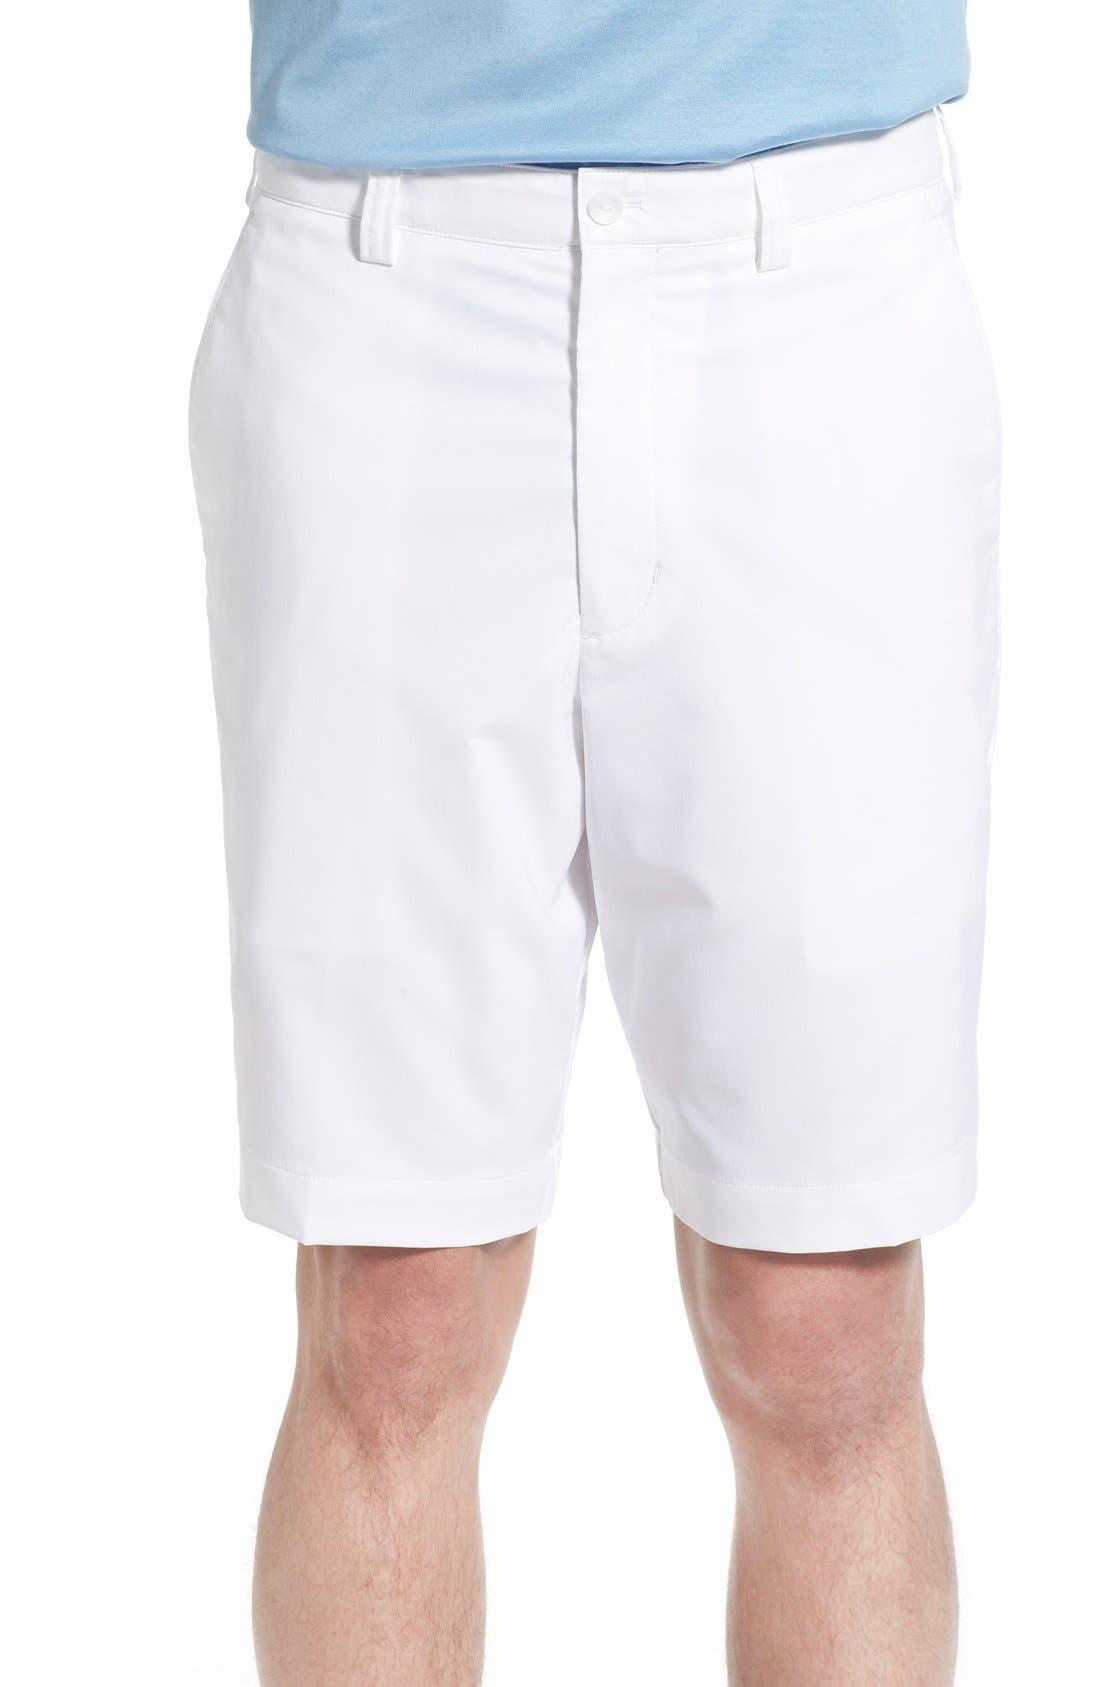 CUTTER & BUCK, DryTec Shorts, Main thumbnail 1, color, WHITE